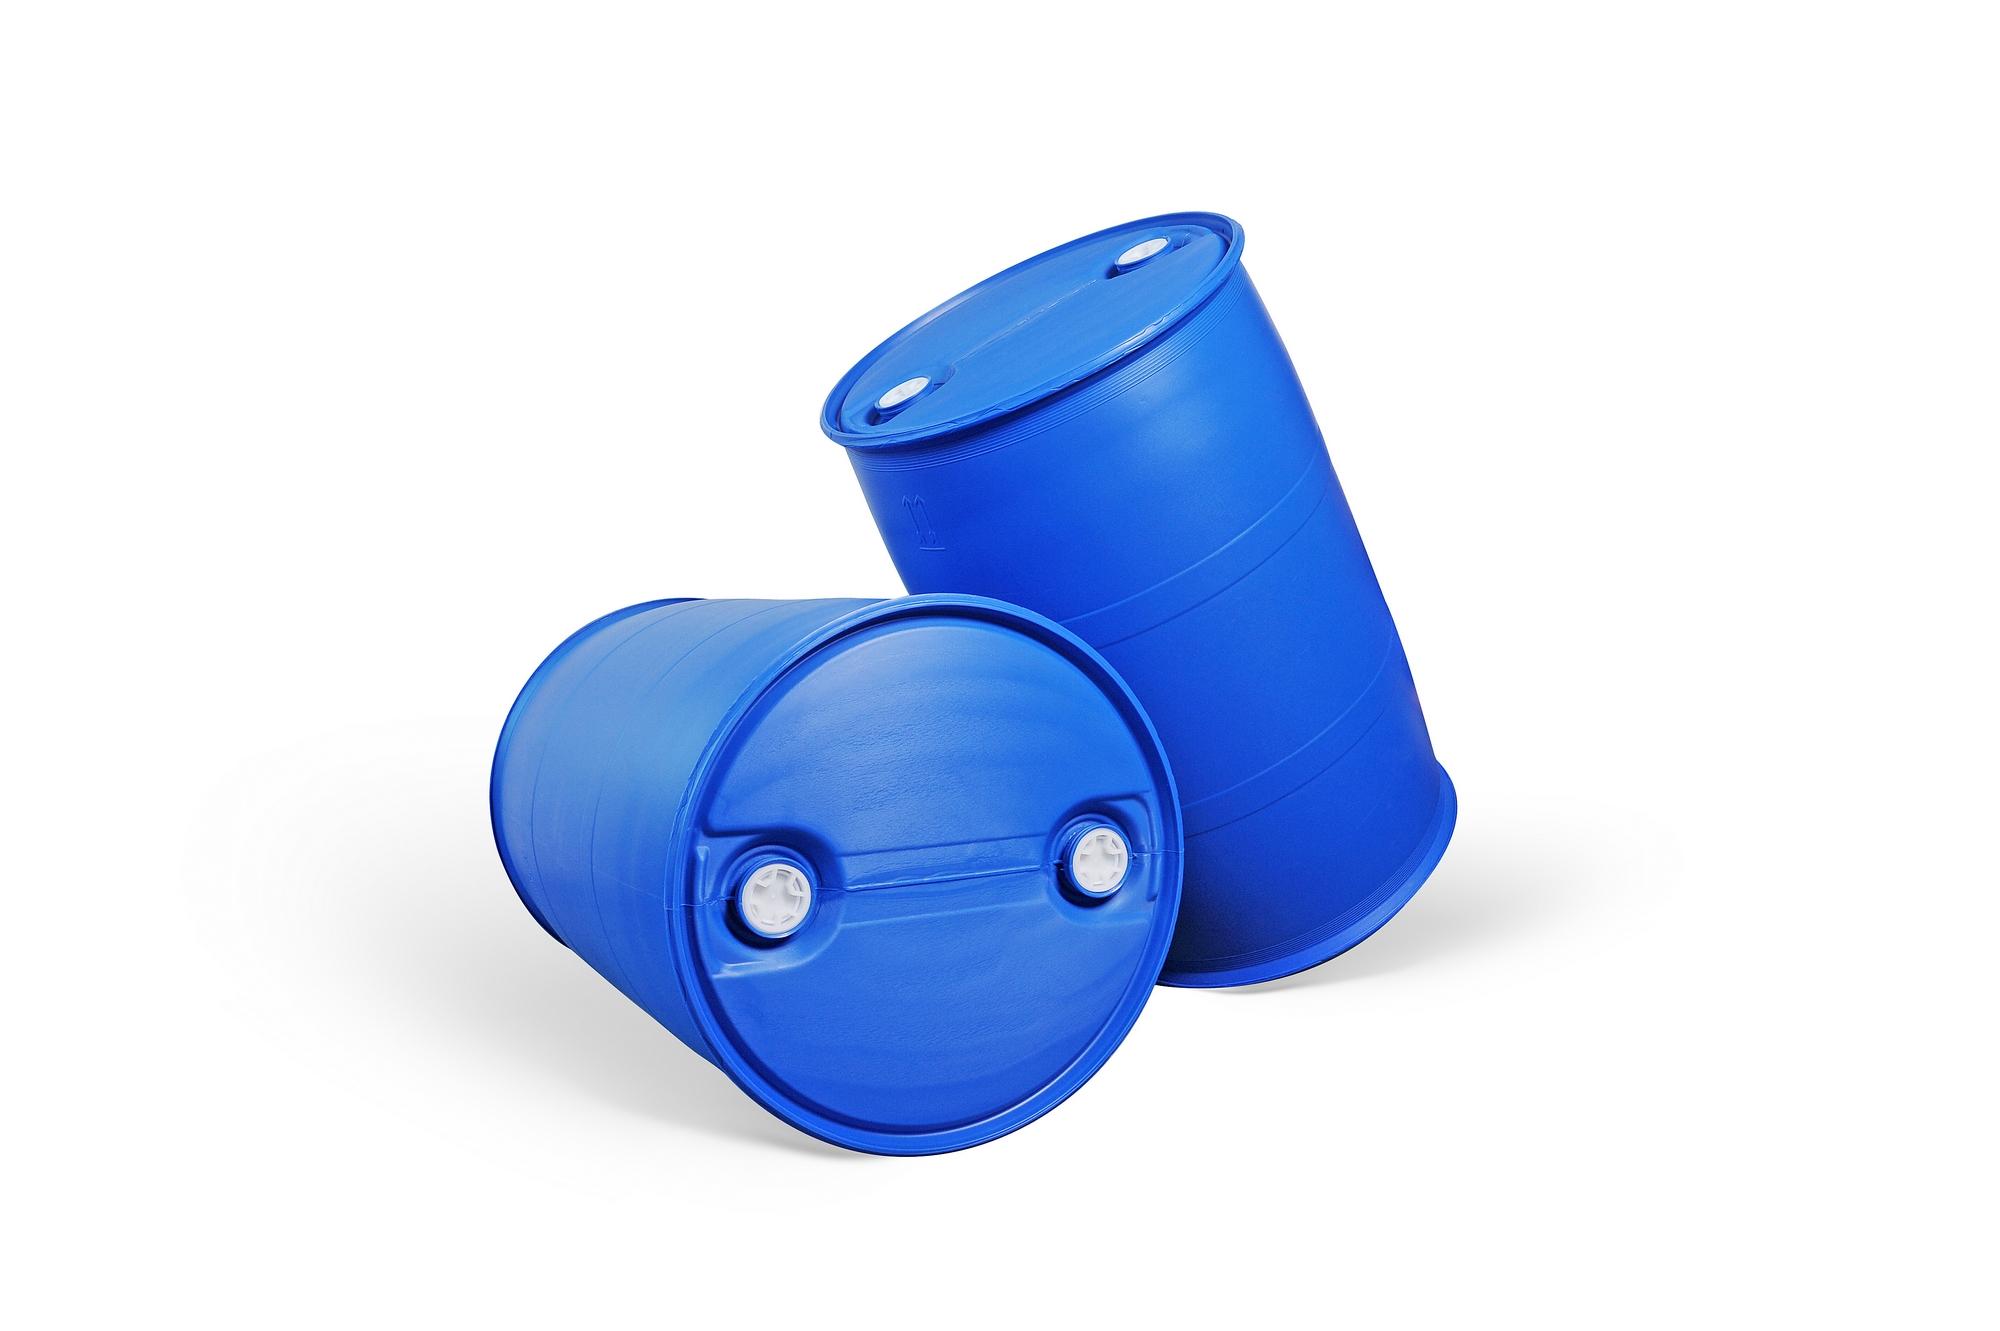 200L塑料桶G1款式 1、产品特点 A、桶型美观,根据力学原理设计,独特的桶型结构使产品具有更高的抗跌落性能,强度明显优于其他结构款式的200升塑料桶。 B、桶口采用下密封生产工艺,密封性优于国内普遍的上密封生产工艺,密封性能更好。 C、凸桶面结构设计,在暴雨季节桶面不会积水,可有效防止雨水从桶口位置渗进桶内污染您的液态产品。 D、双L环的桶型结构使塑料桶在运输过程中滚动、装运更加方便,在热灌装的时候可有效的防止桶底部侧面凹陷。 2、原材料使用 A、我们采用的原材料为高分子量高密度聚乙烯(HMWHDPE